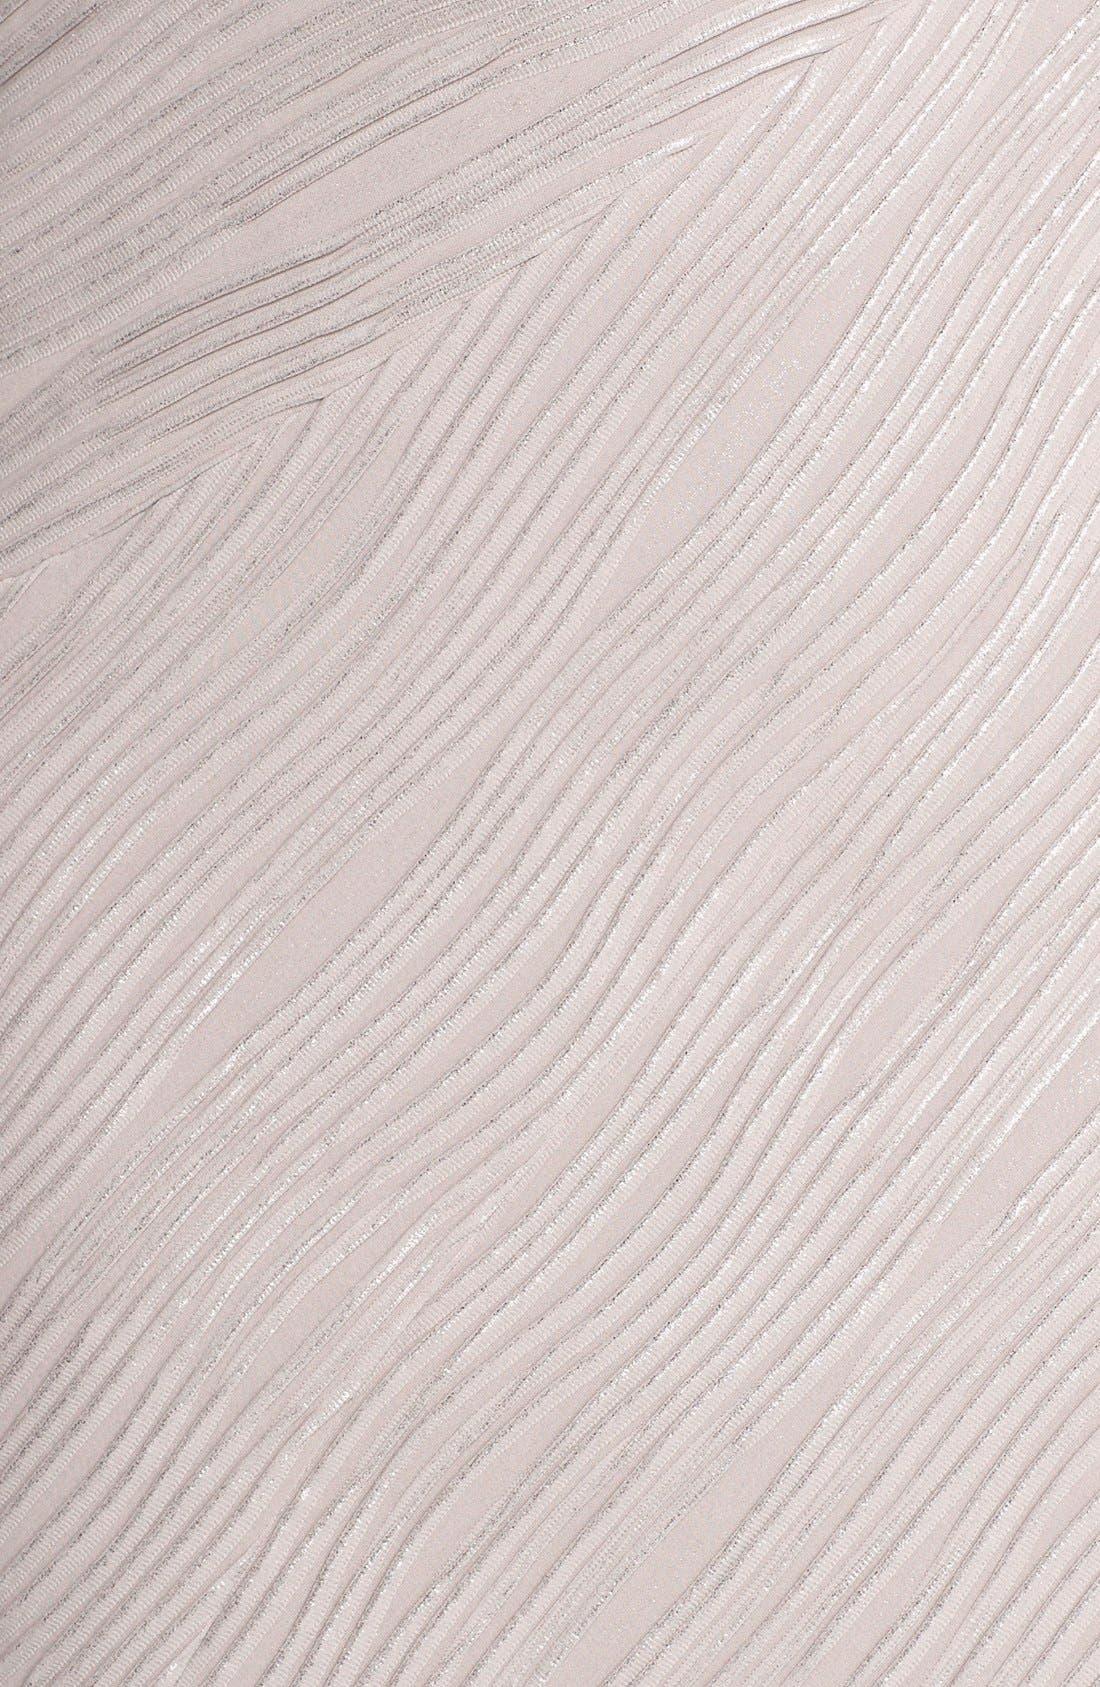 Embellished Sleeve Knit Sheath Dress,                             Alternate thumbnail 6, color,